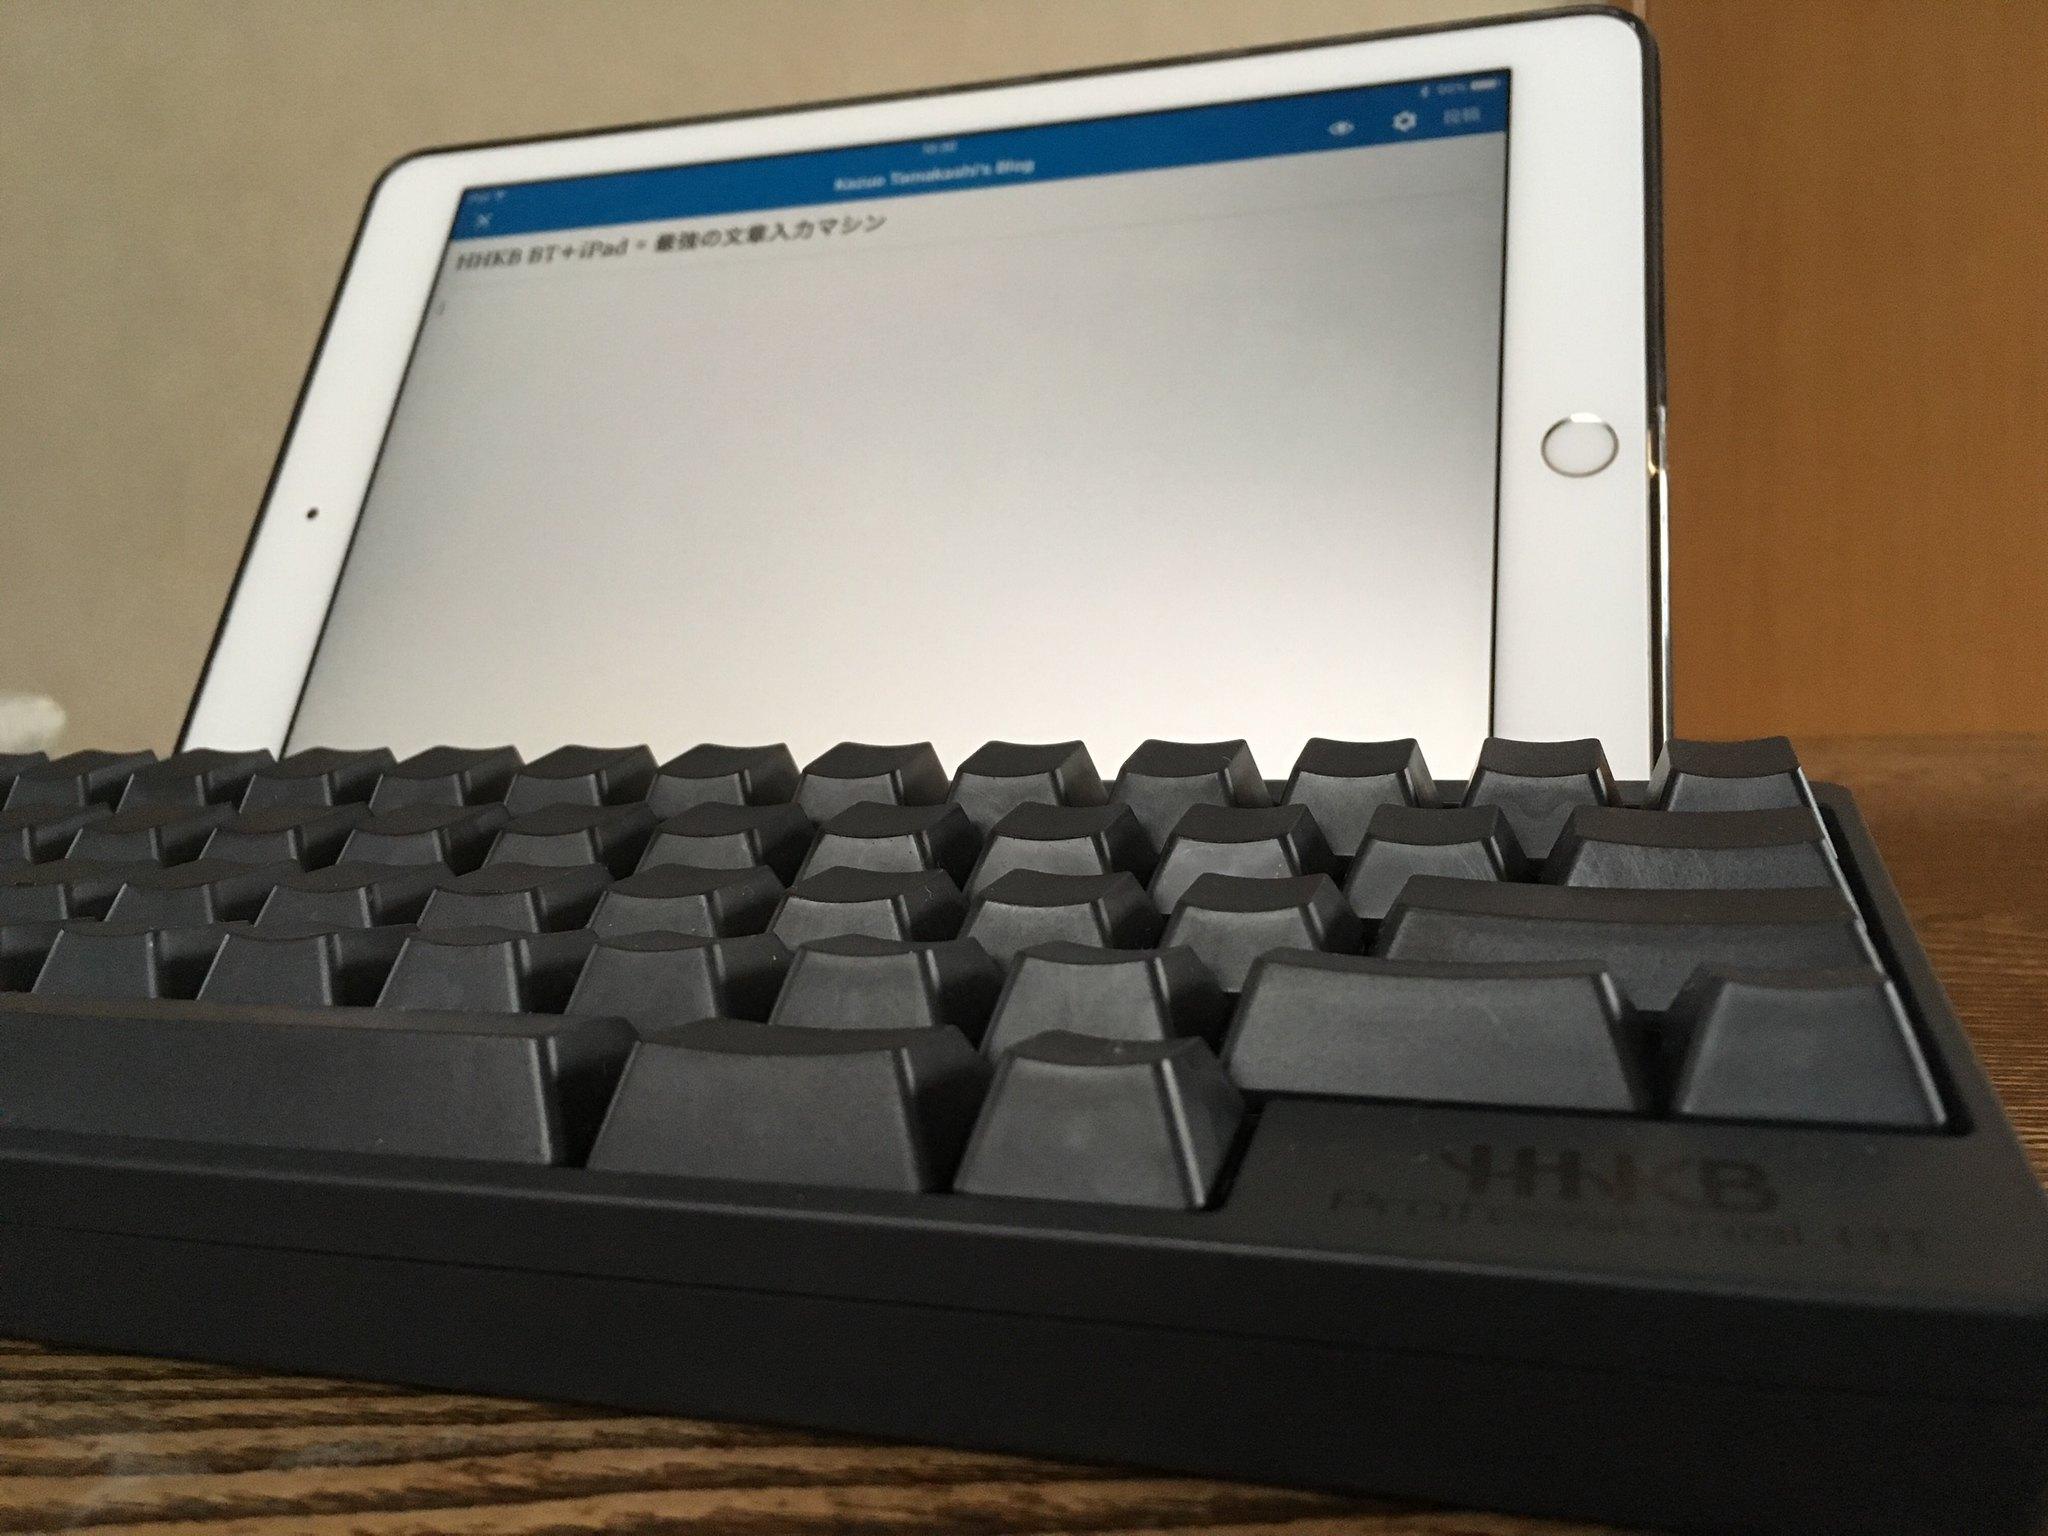 HHKB BT + iPad